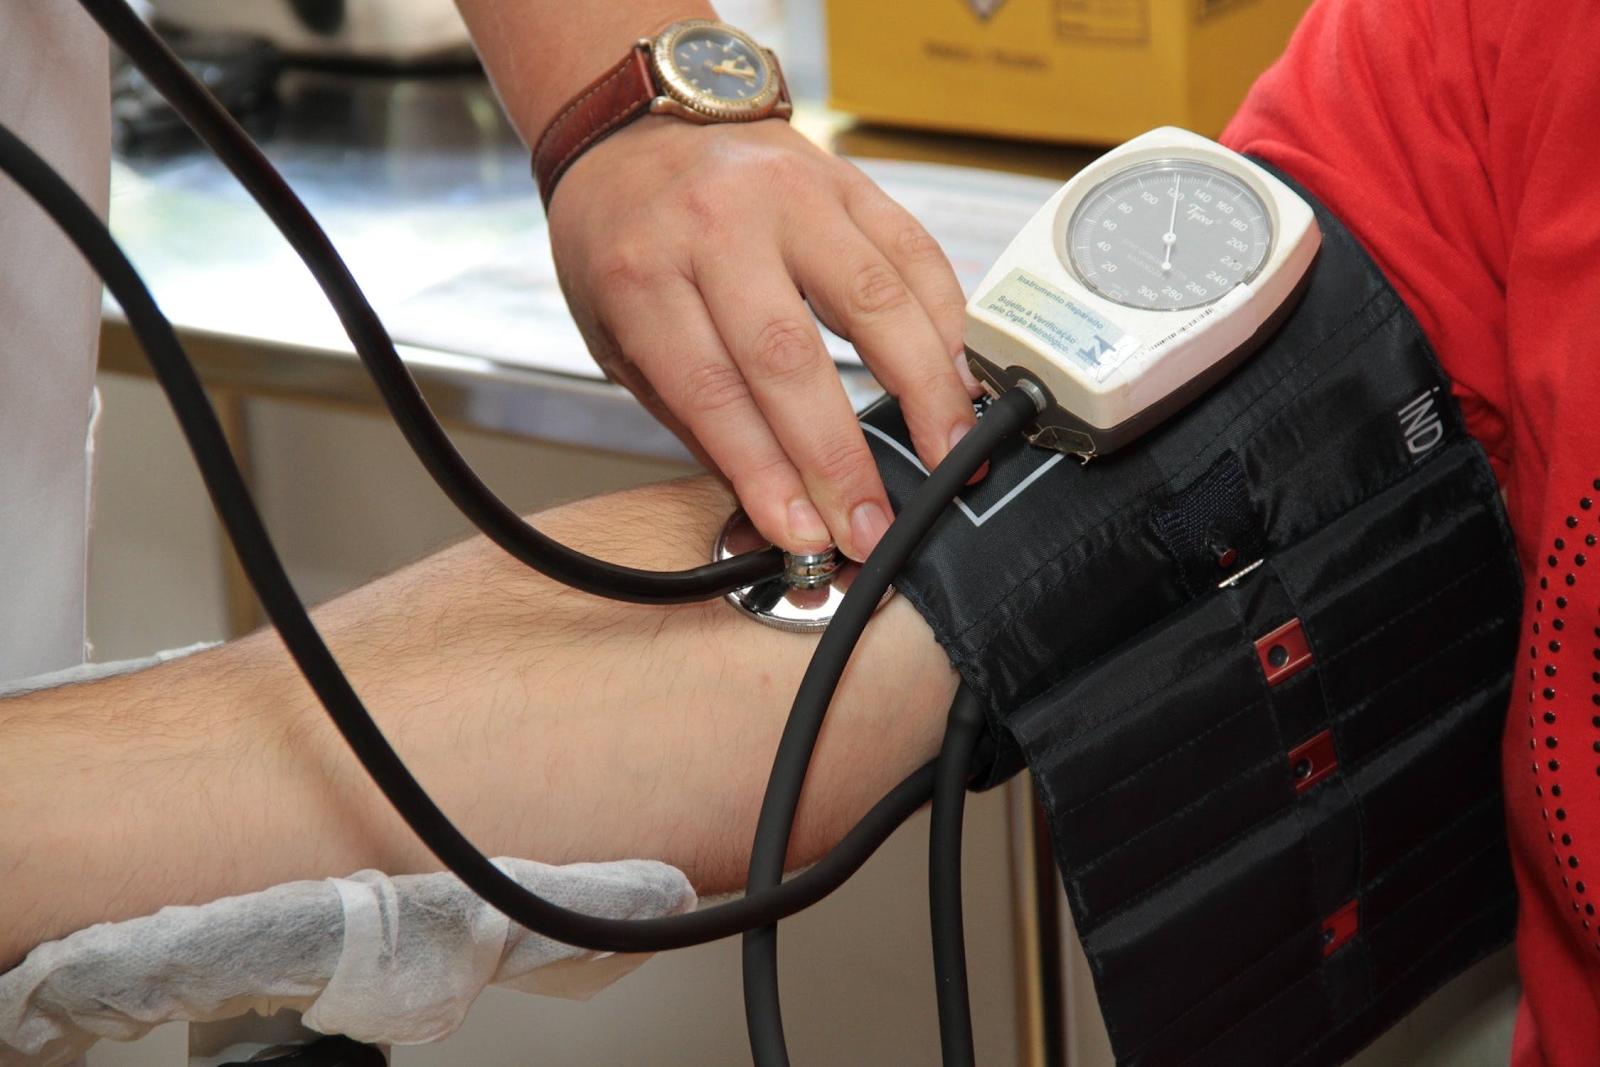 someone getting their blood pressure taken